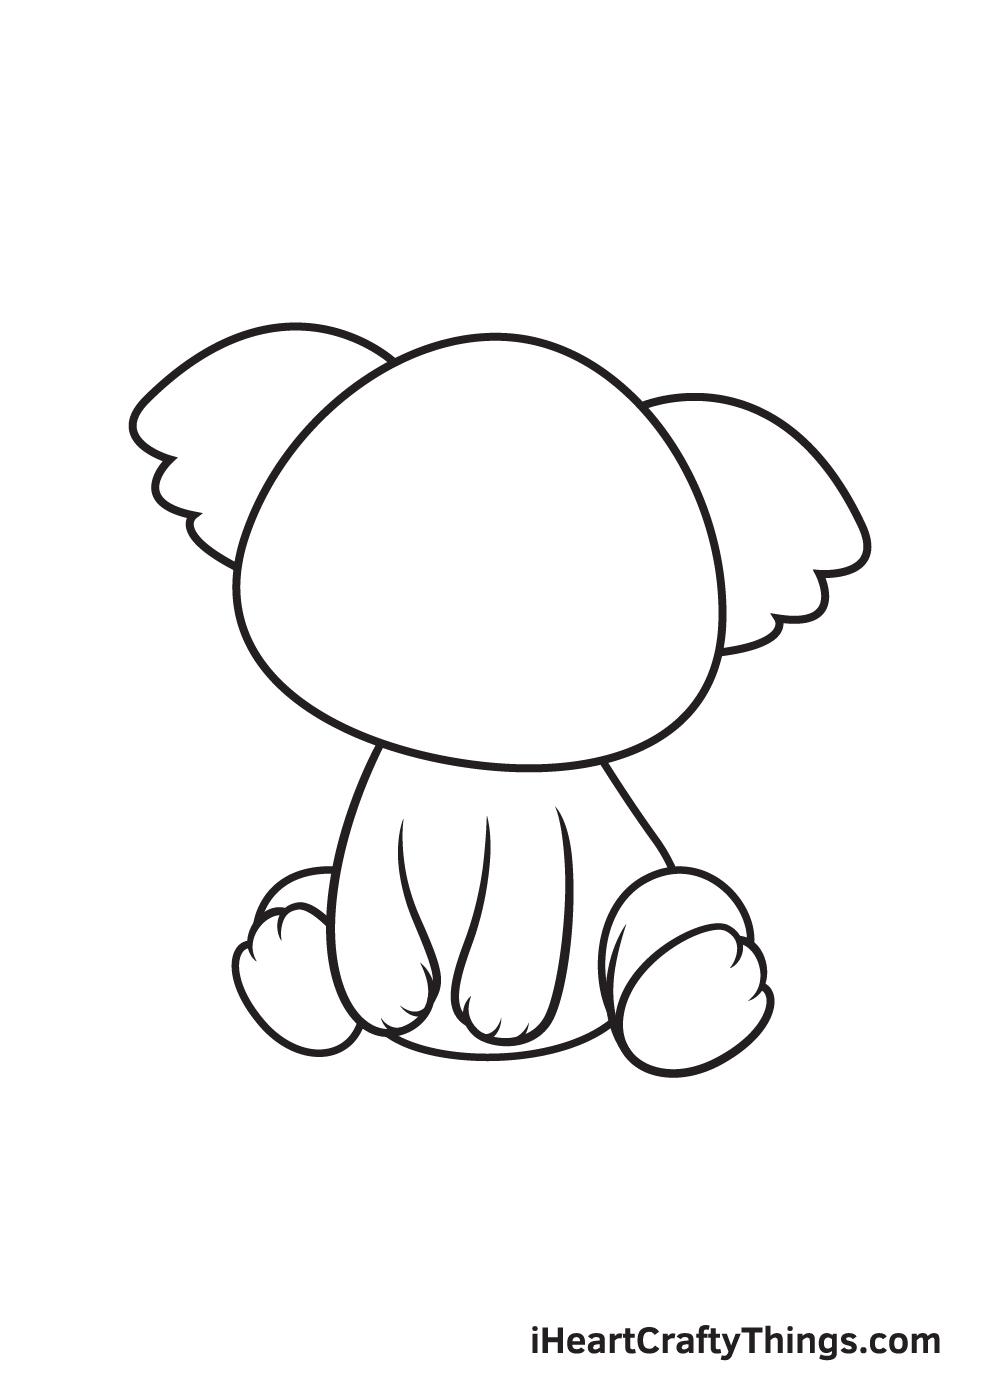 animals drawing step 6